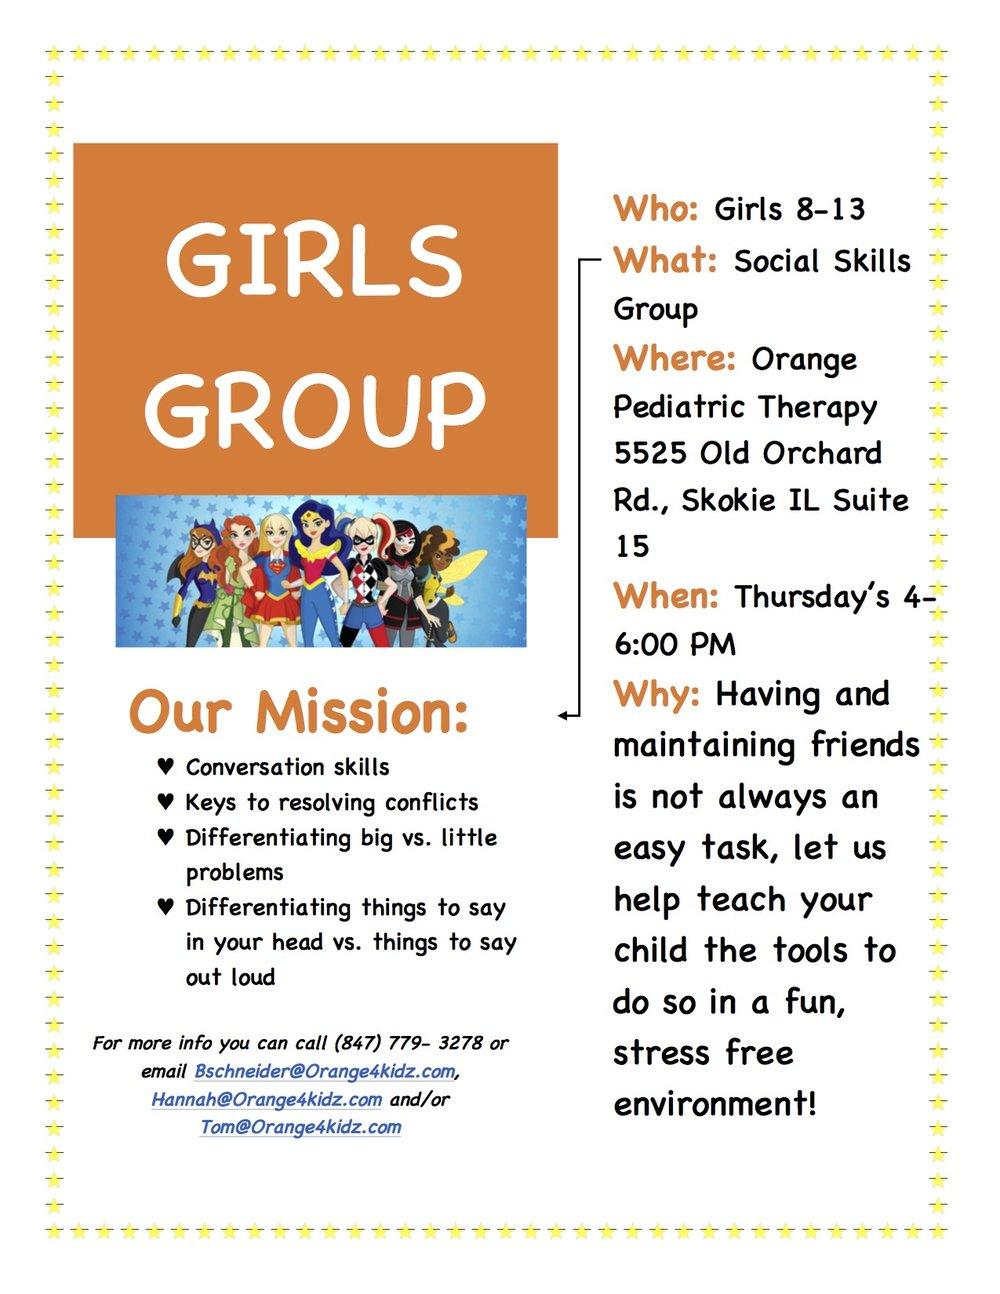 Girls Group! - CLICK FOR CALENDAR OF ACTIVITIES!